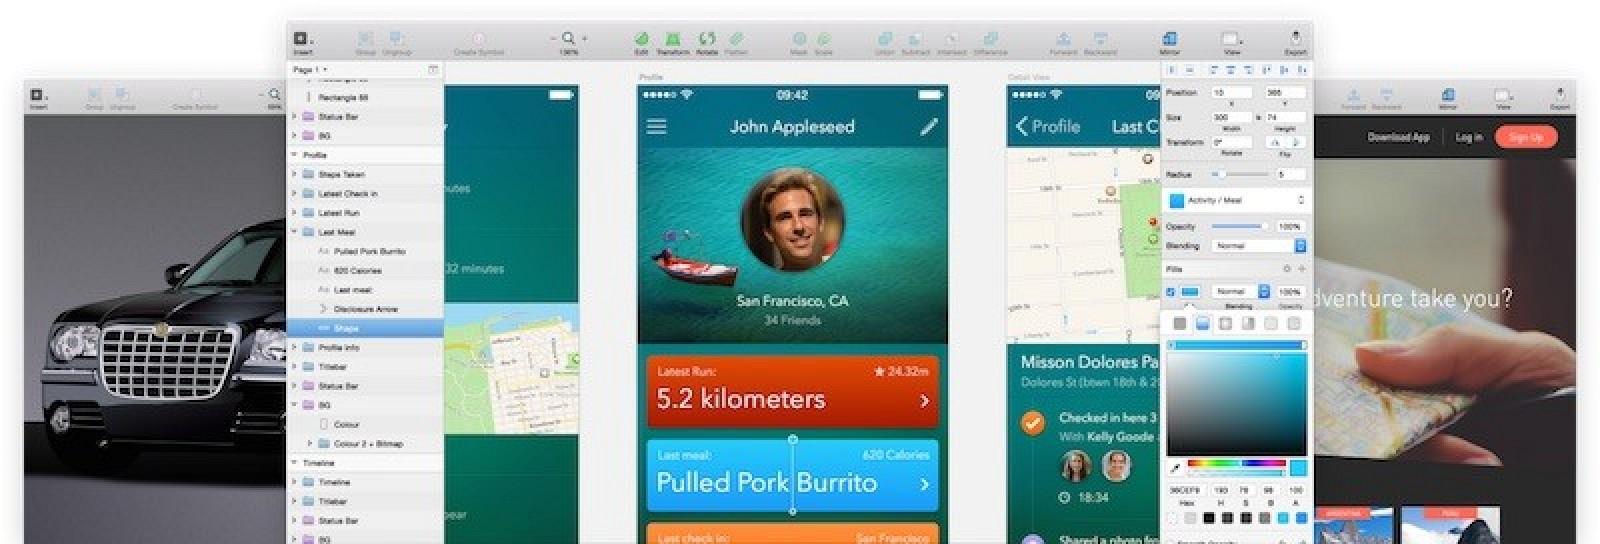 design app for mac popular design app sketch leaves mac app store due to